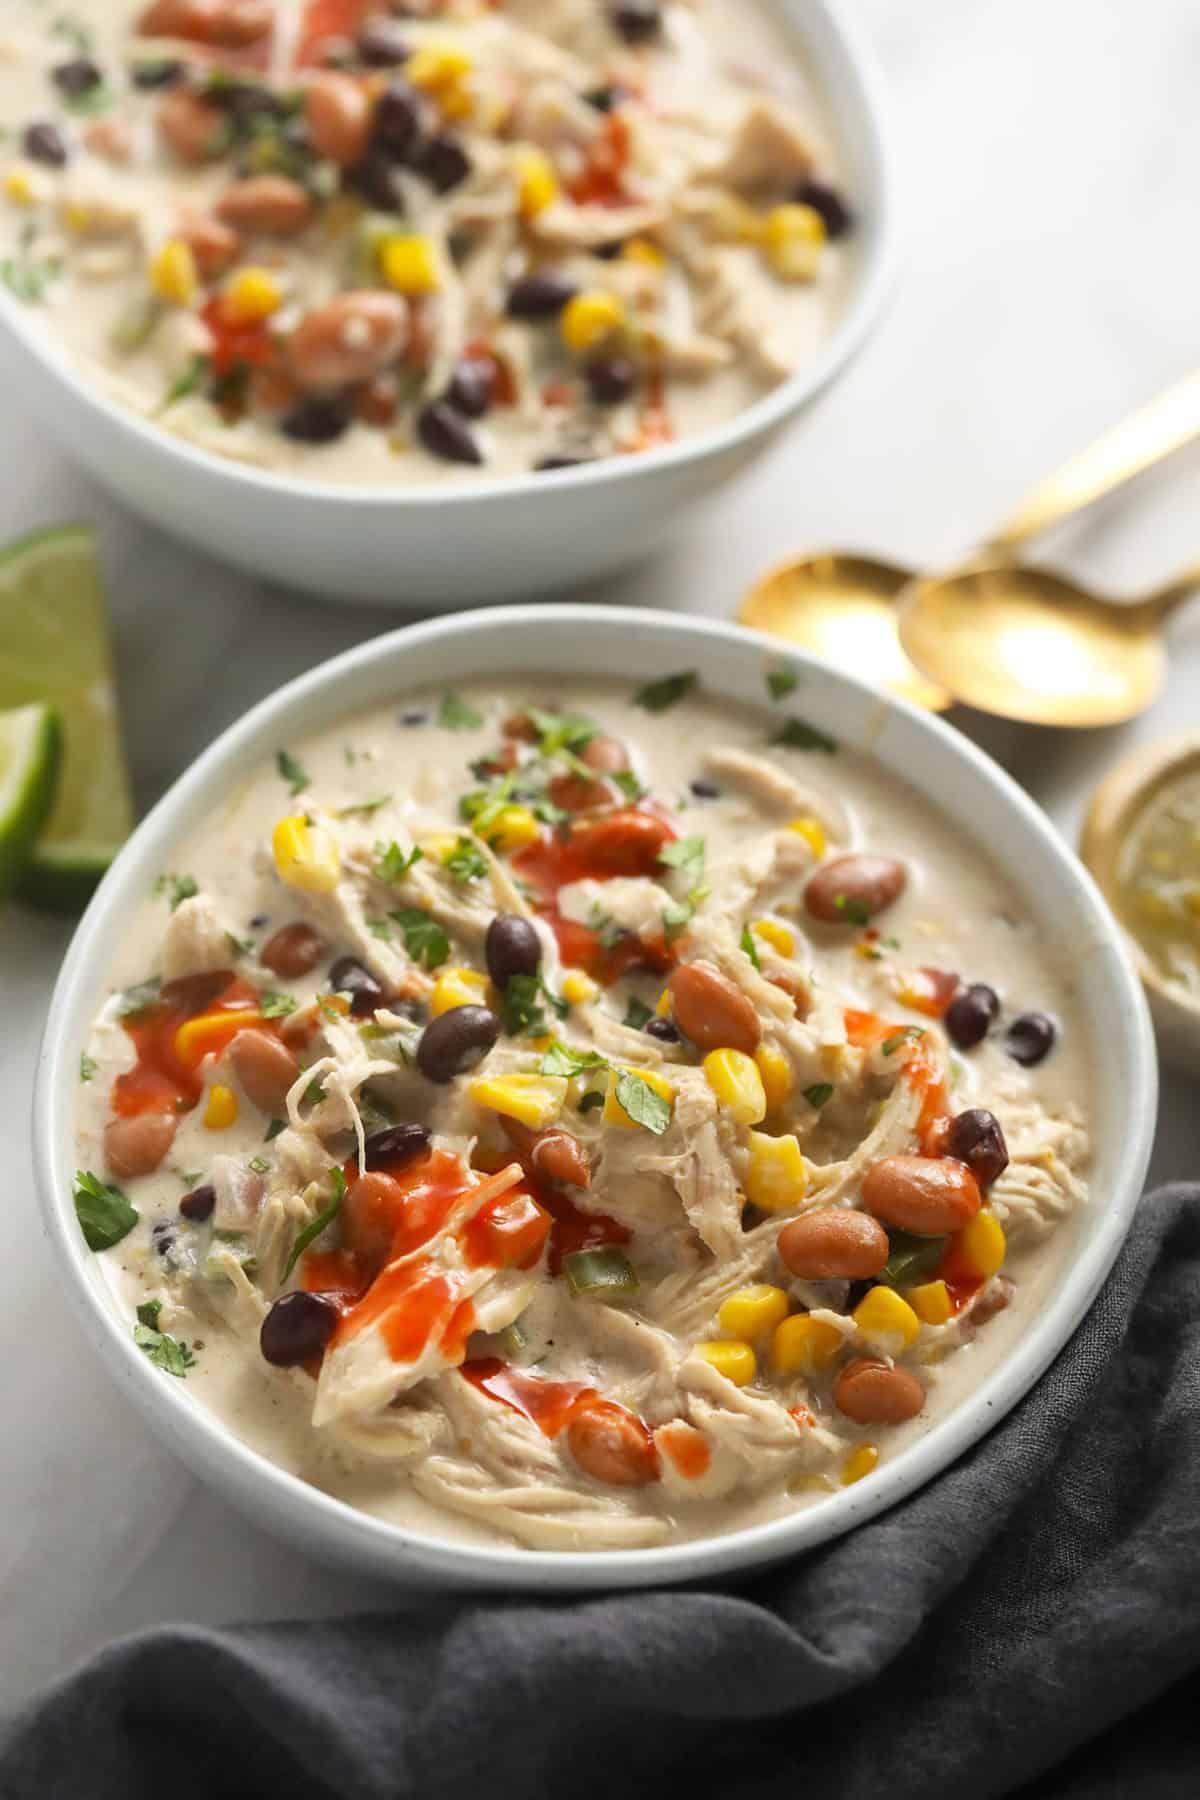 Cream cheese chicken chili in a bowl.